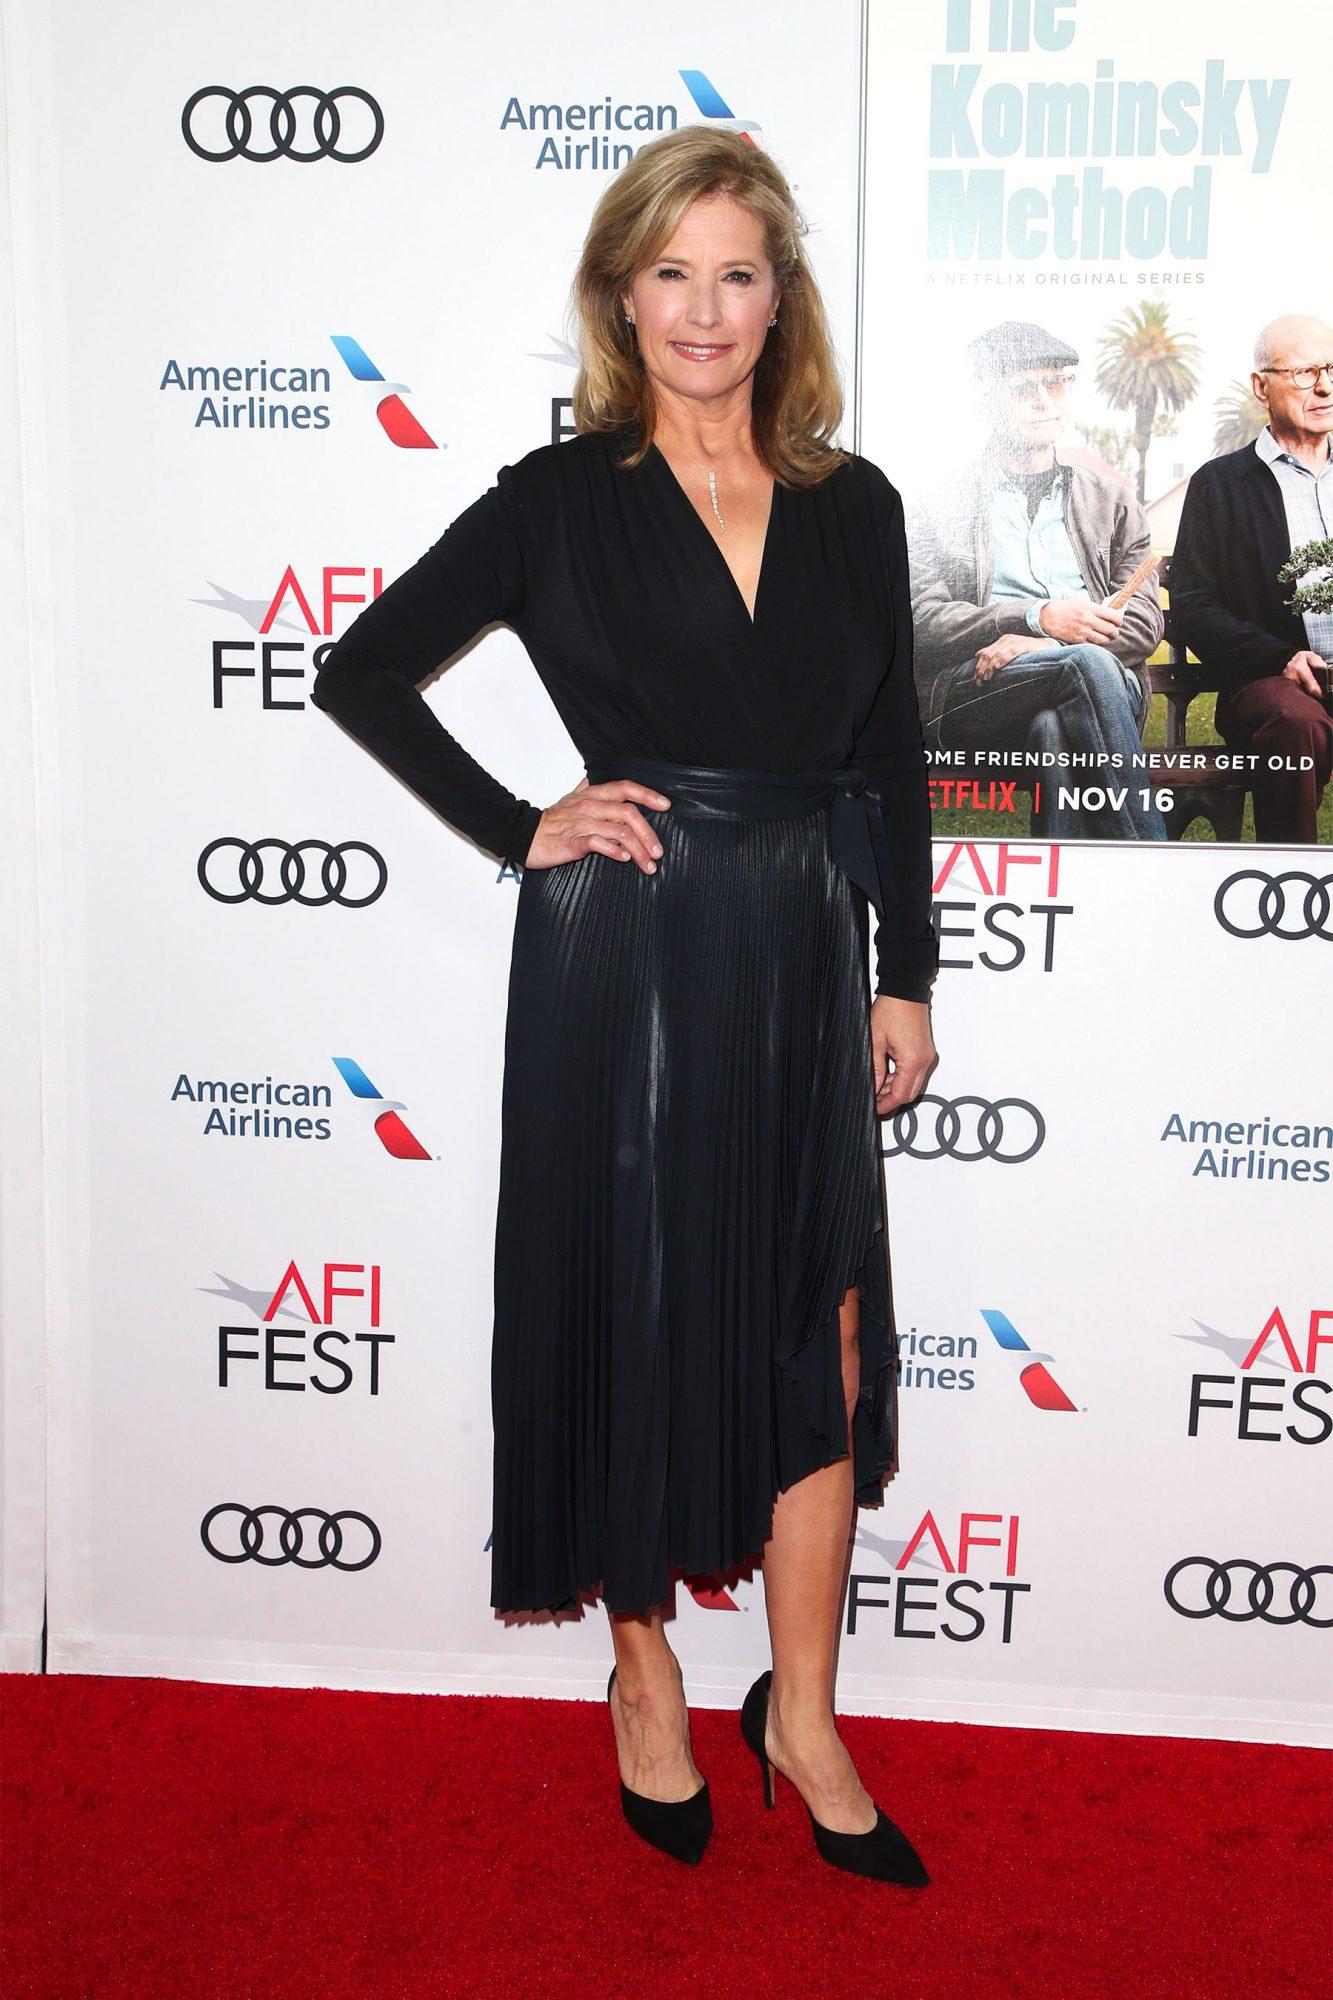 'The Kominsky Method' film screening, AFI Fest, Los Angeles, USA - 10 Nov 2018